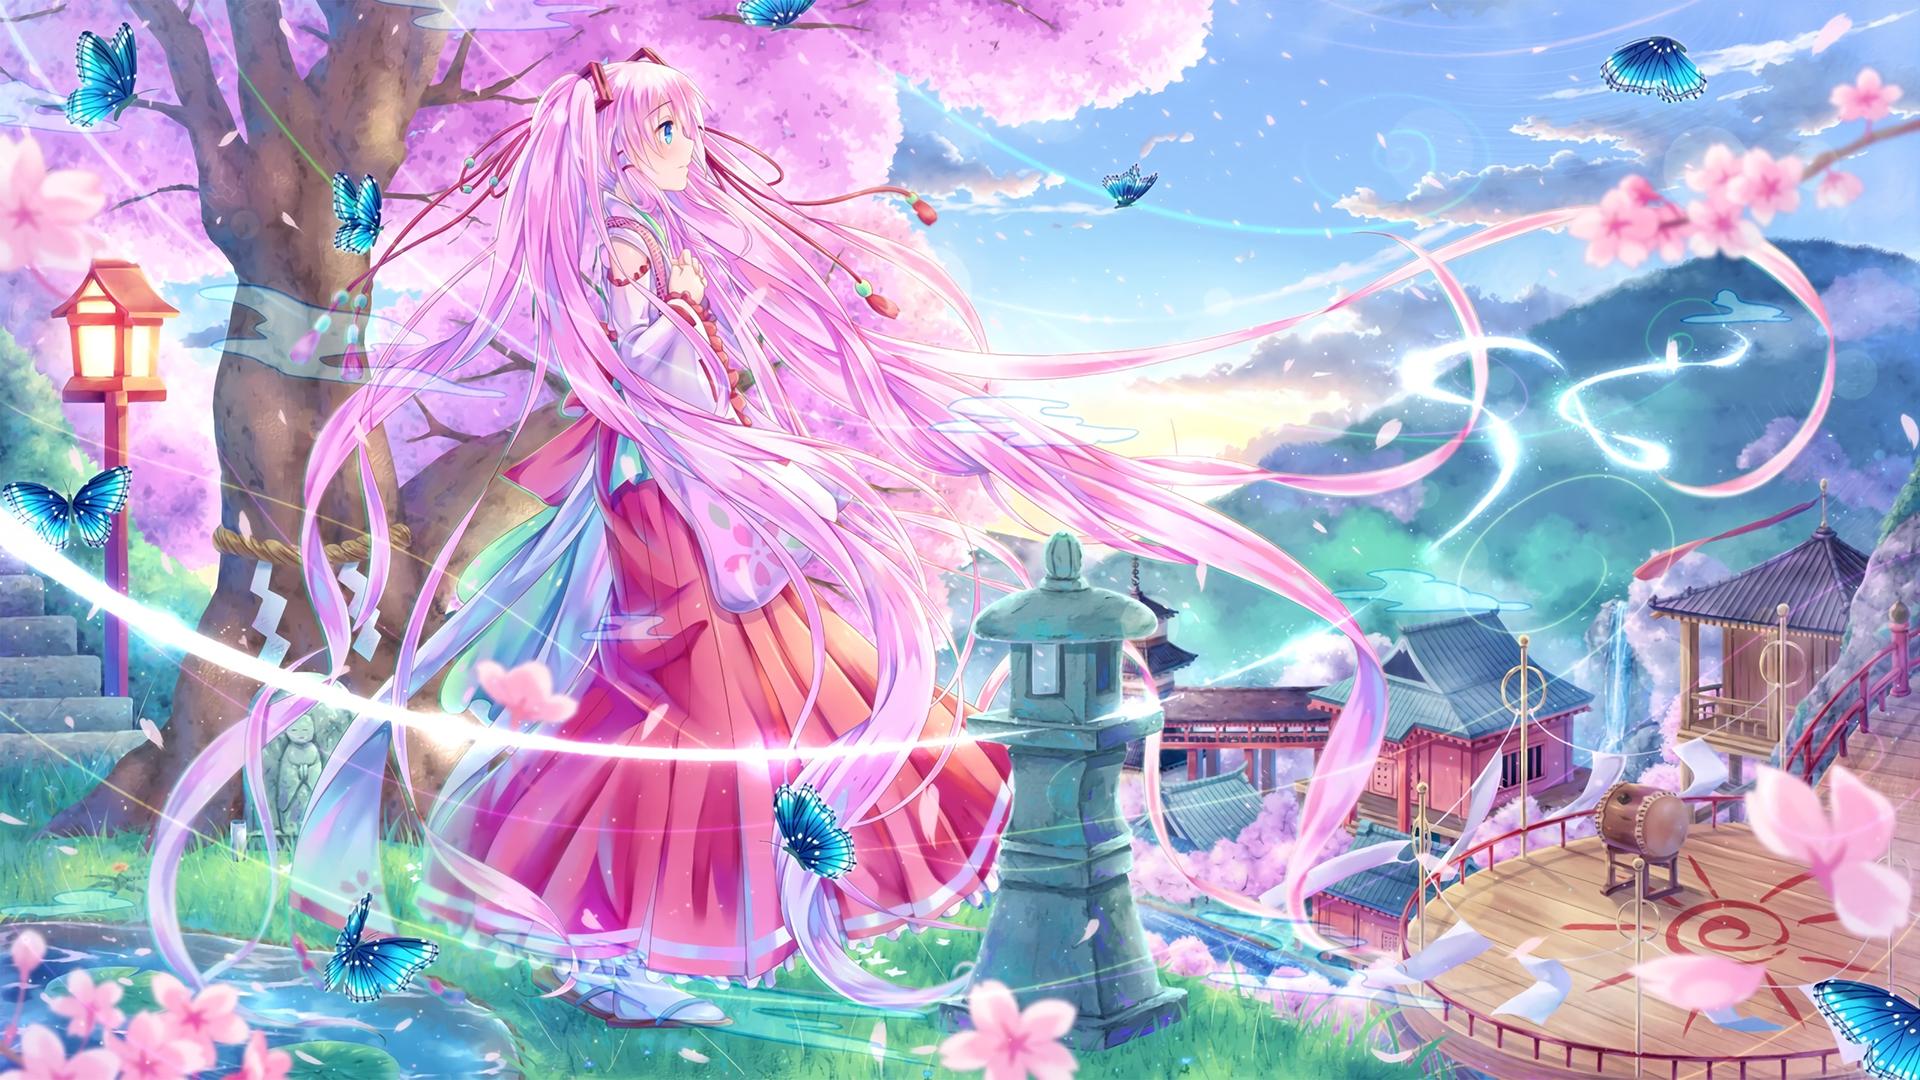 sakura wallpaper girls anime - photo #9